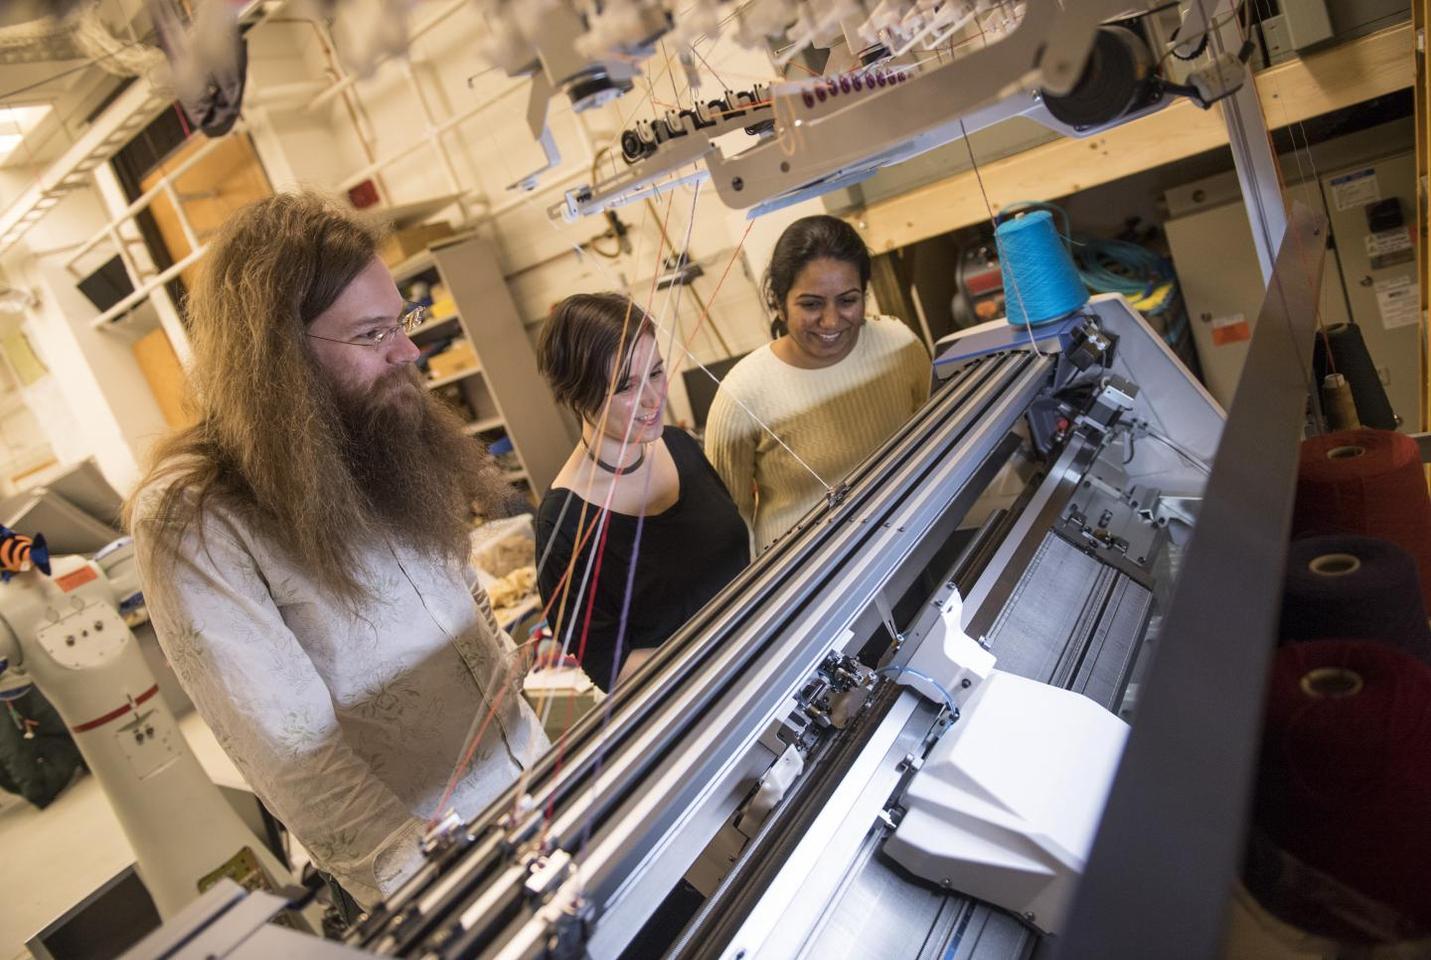 James McCann, Lea Albaugh and Vidya Narayanan watch a knitting machine work on a 3D shape